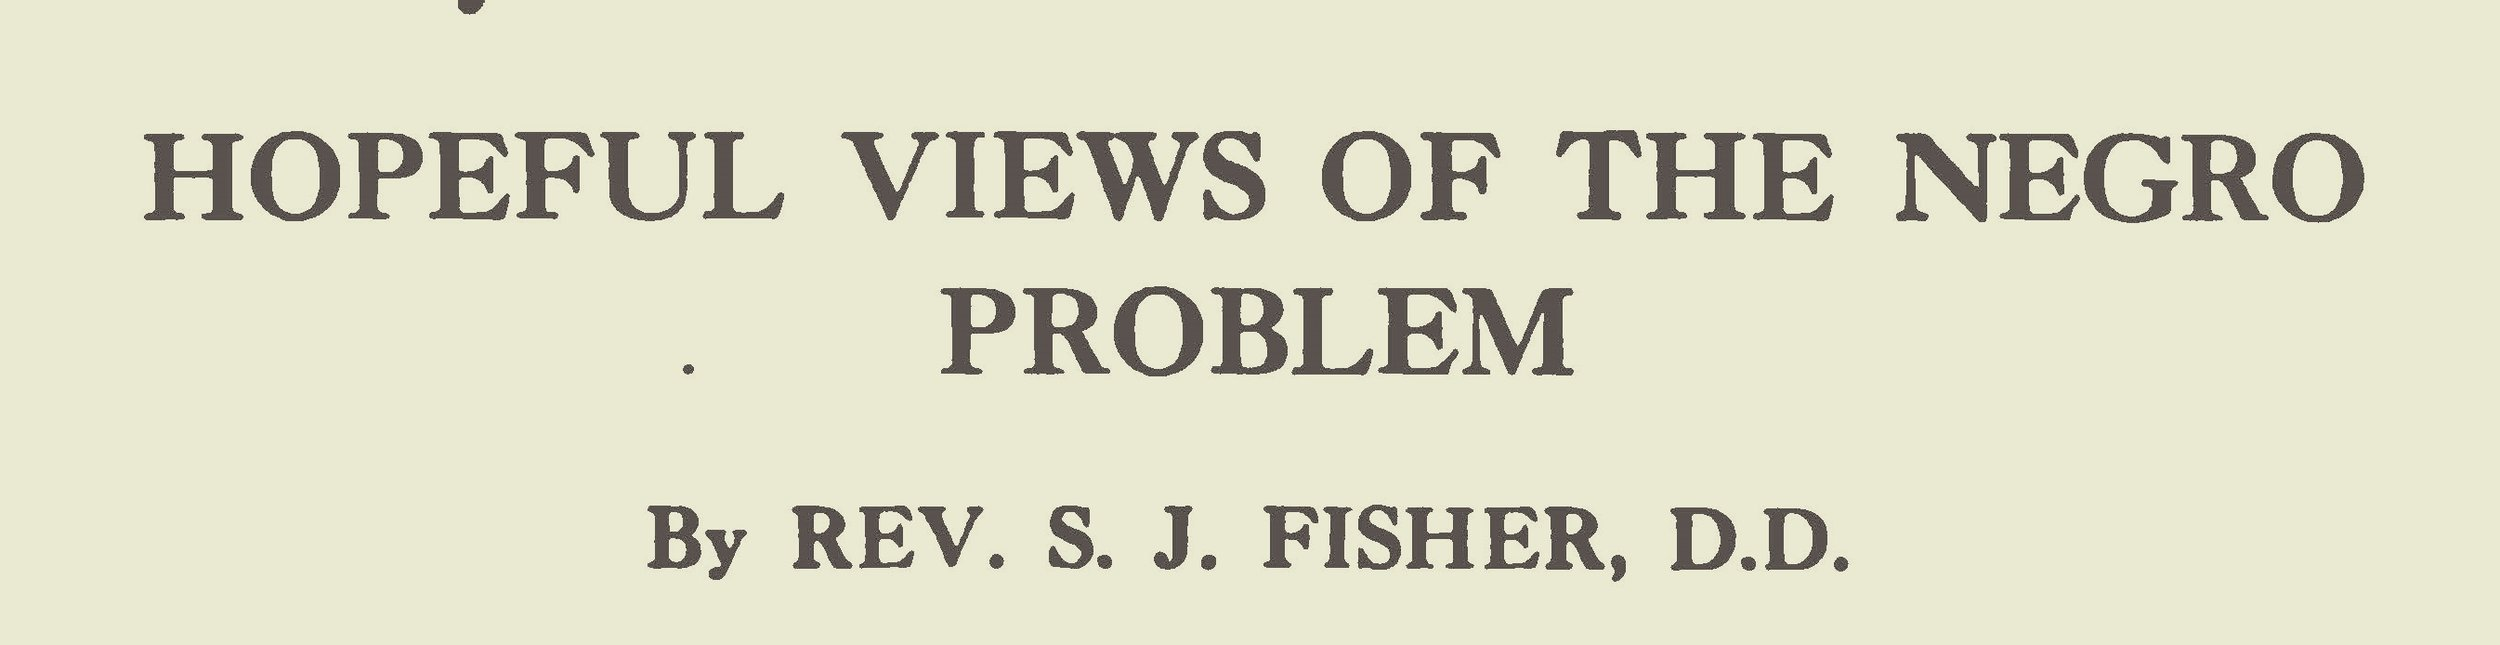 Fisher, Samuel Jackson, Hopeful Views of the Negro Problem Title Page.jpg